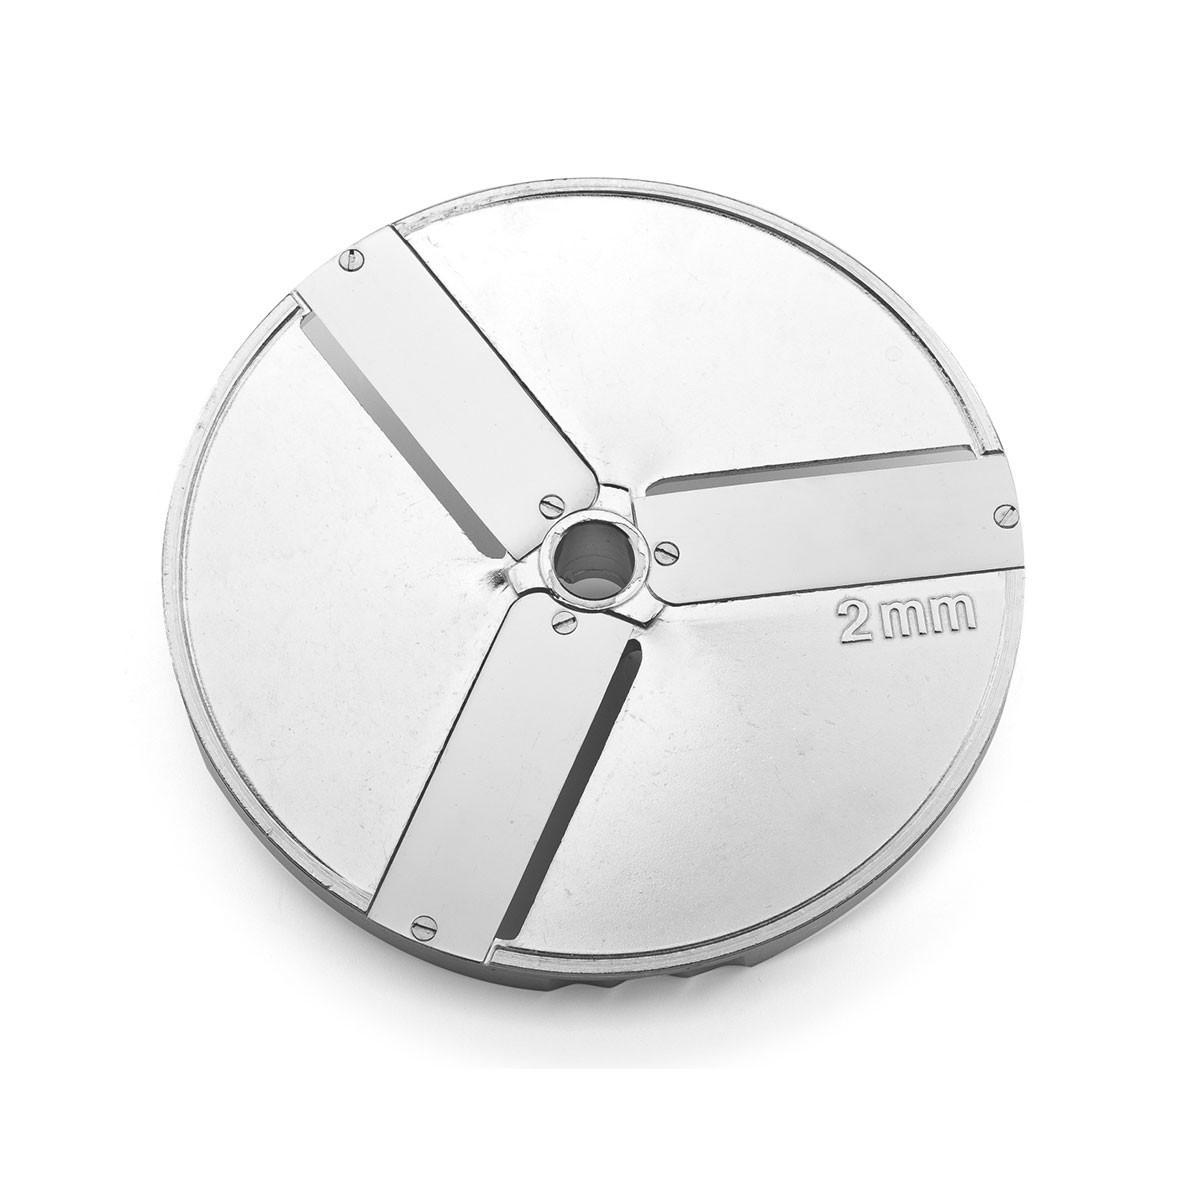 Schneidescheibe AS002 aus Aluminium - 2 mm Saro